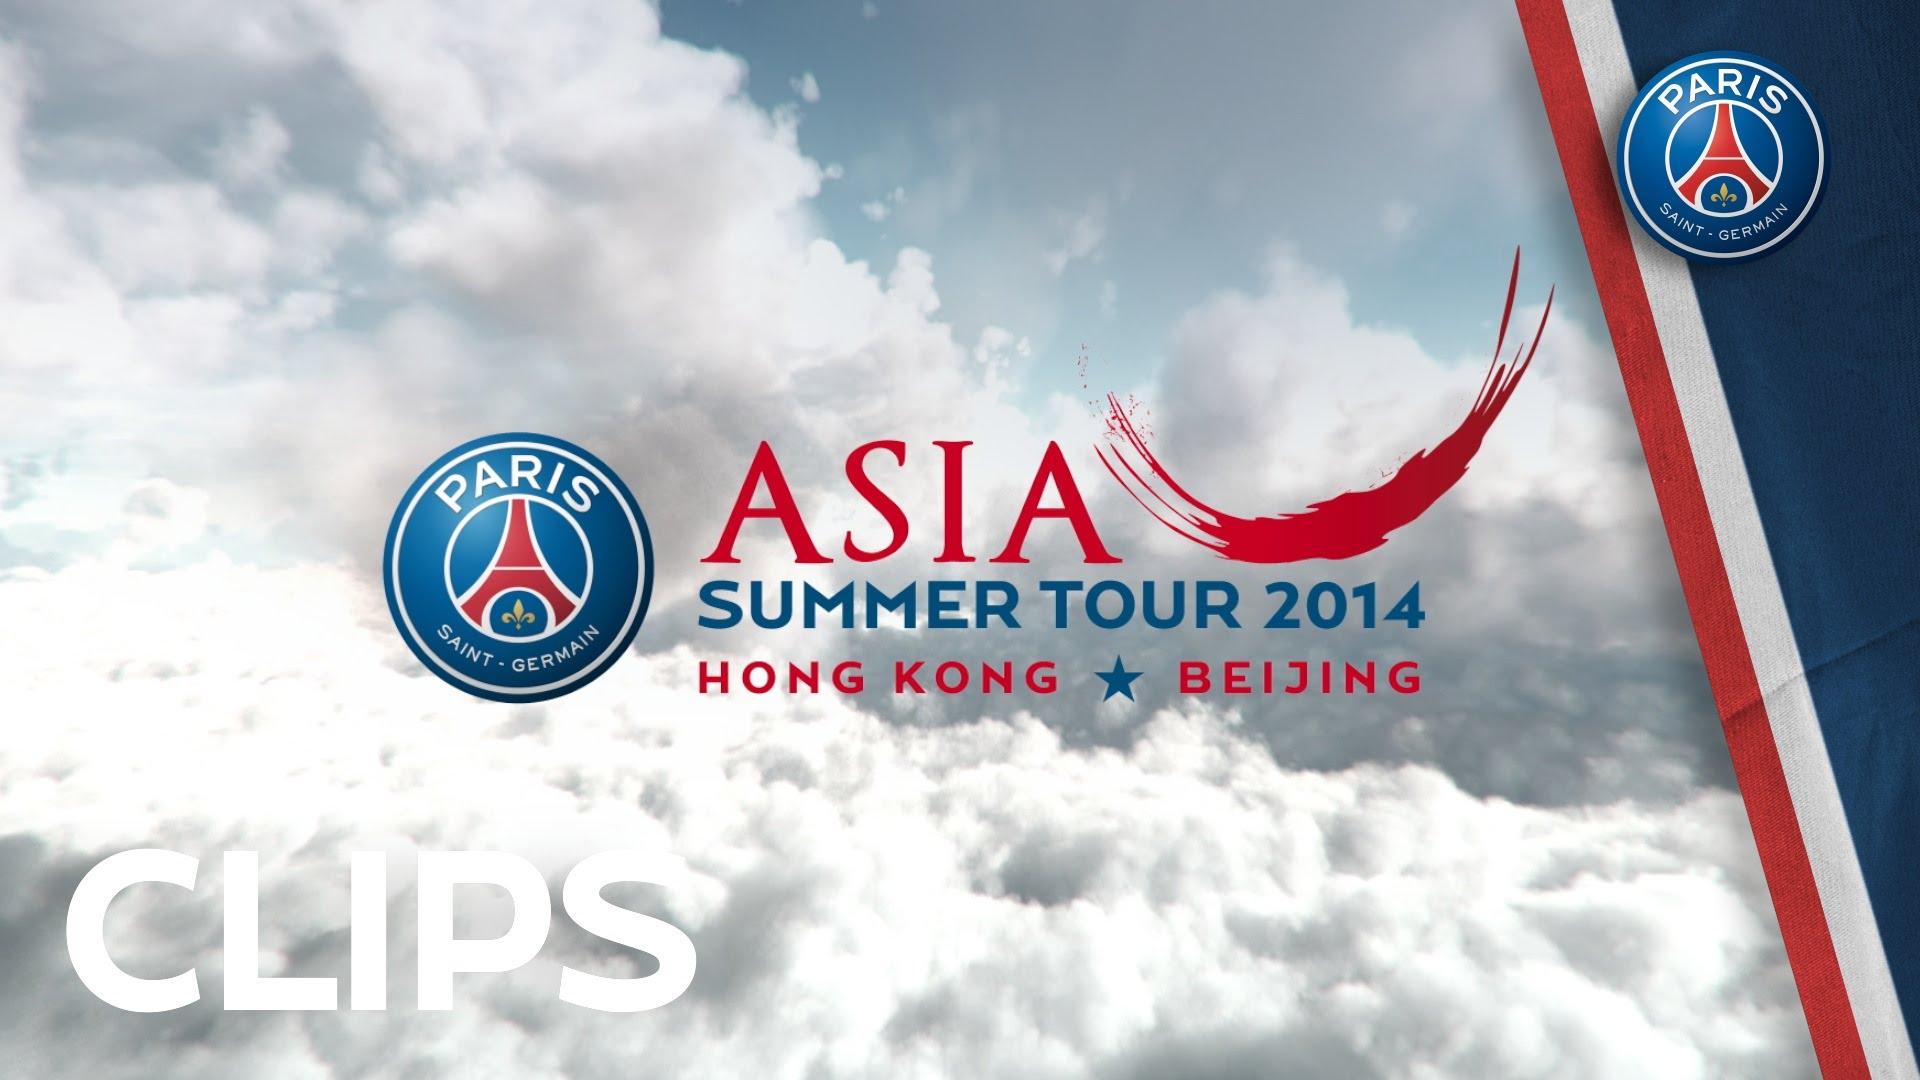 Asia Summer Tour